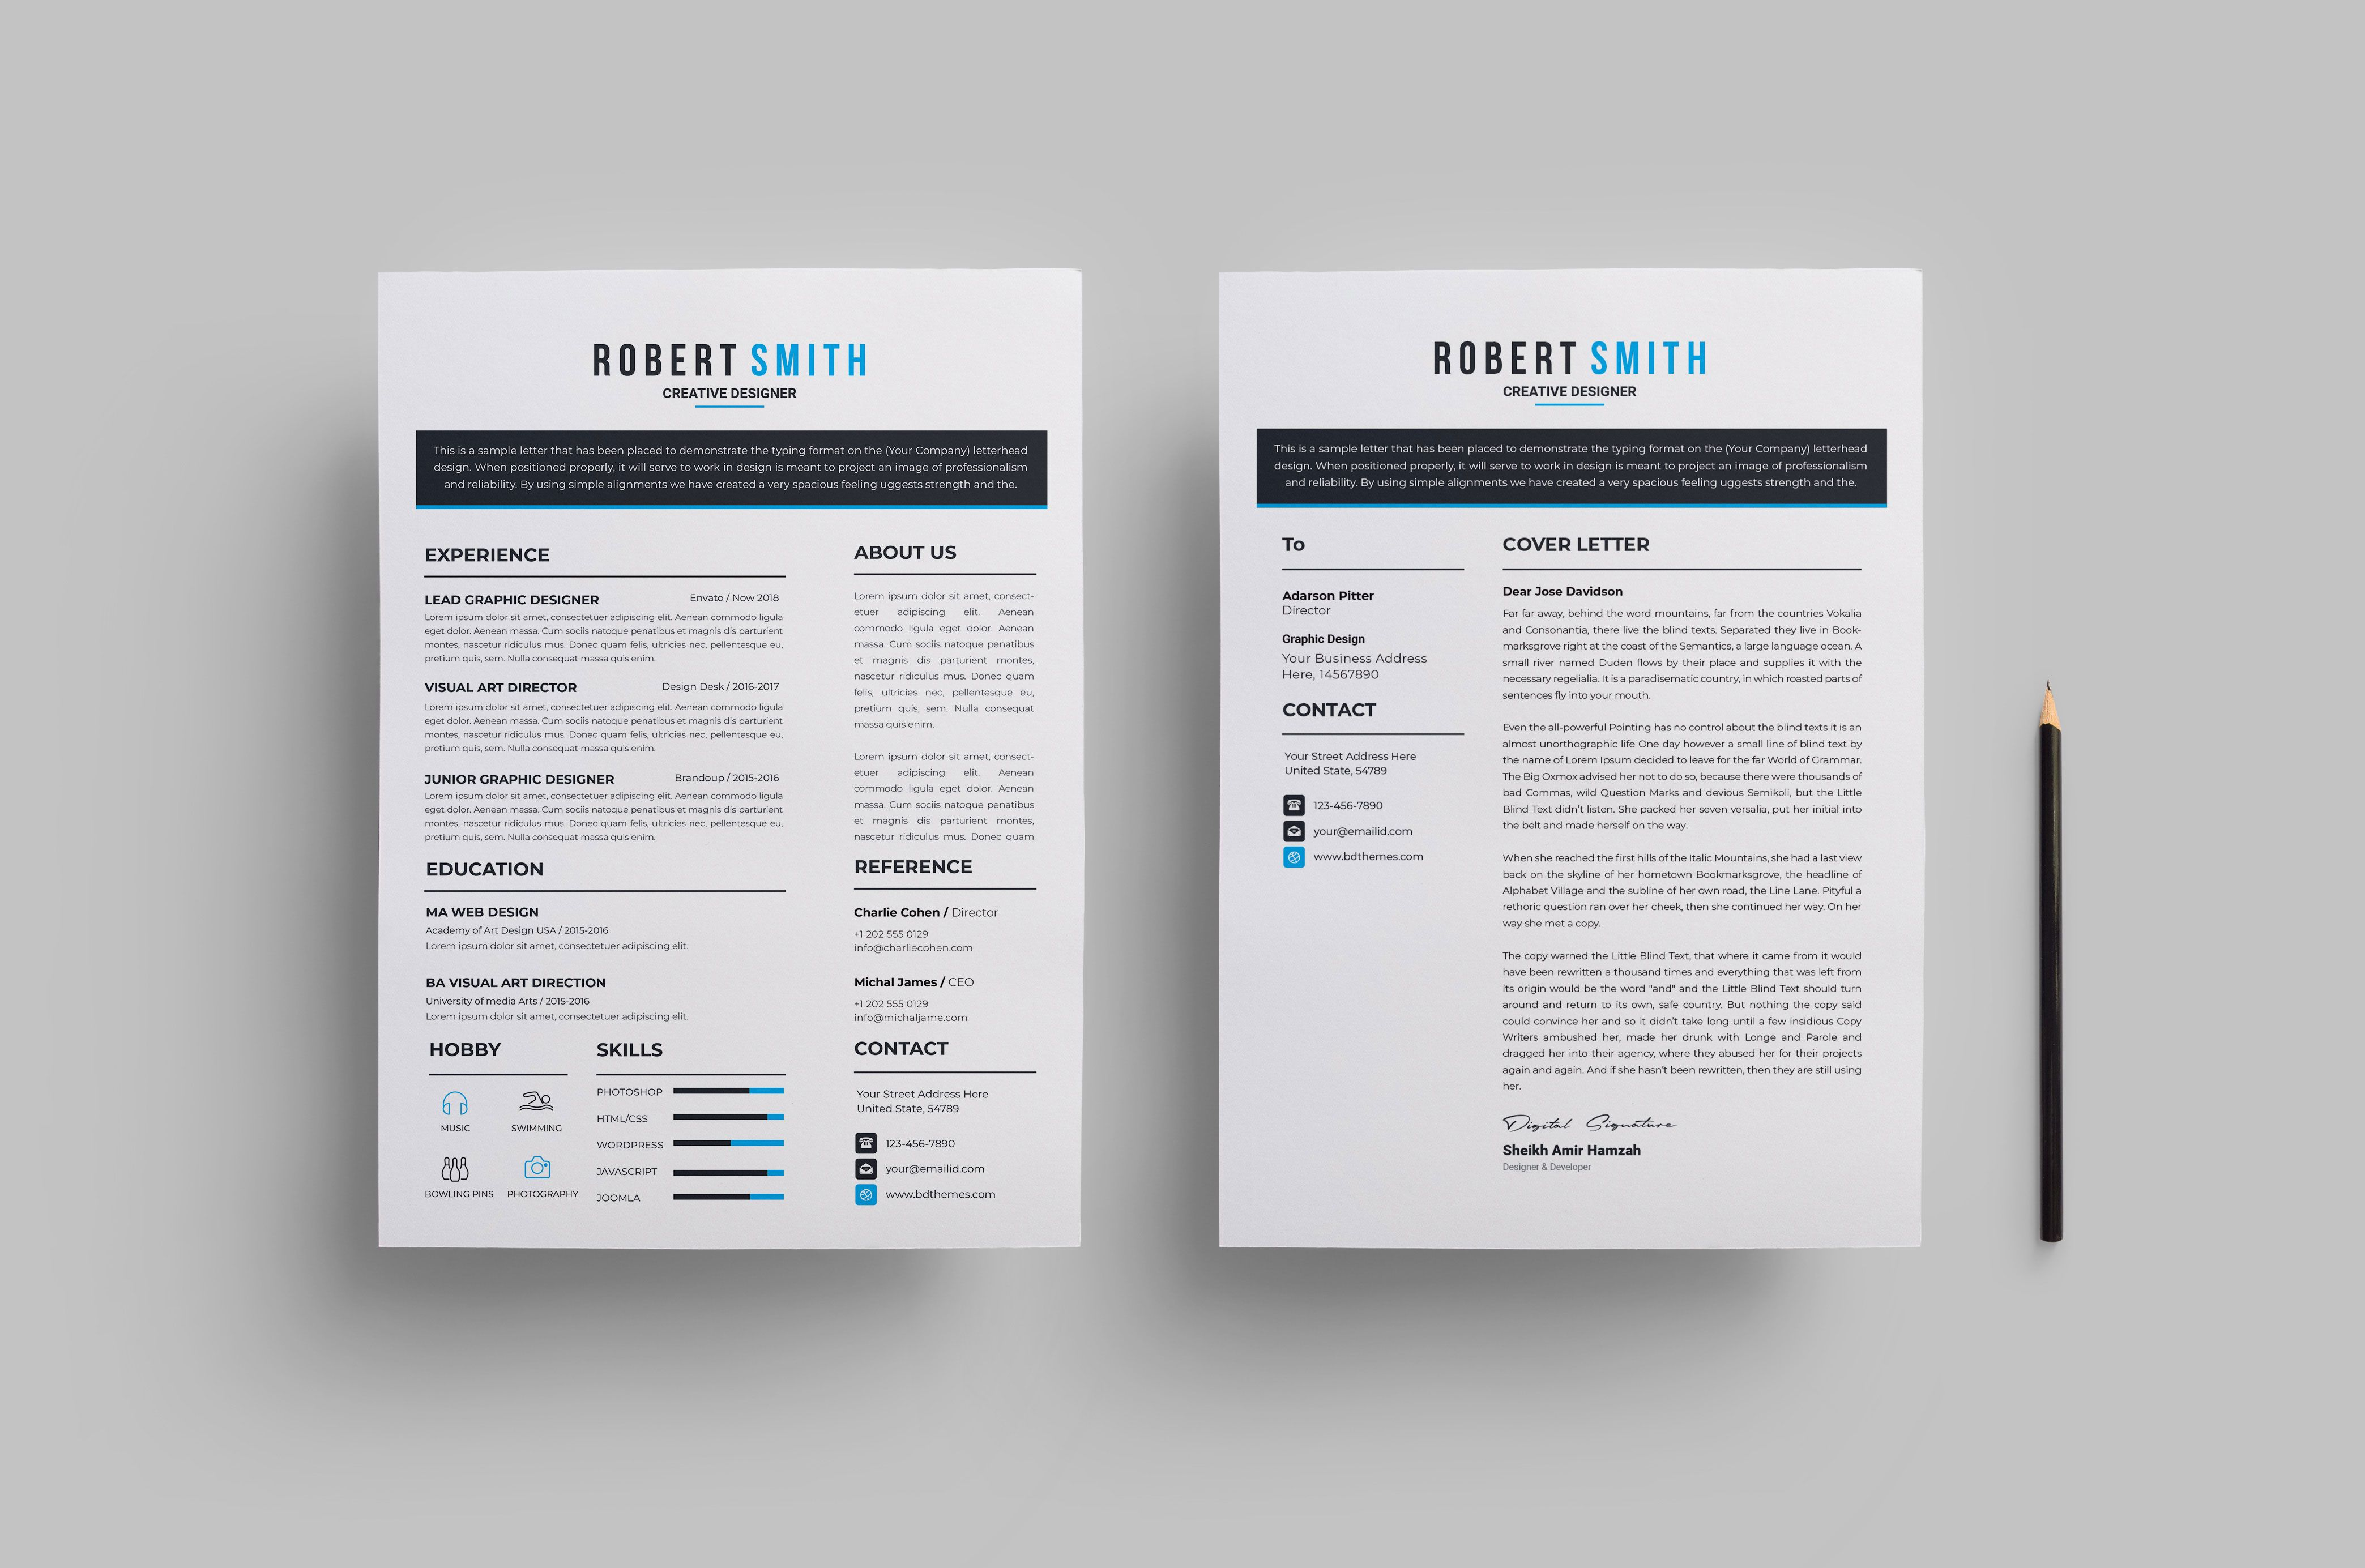 Minimalist Sleek Cv Design Graphic Templates Cv Design Resume Design Template Cv Design Template